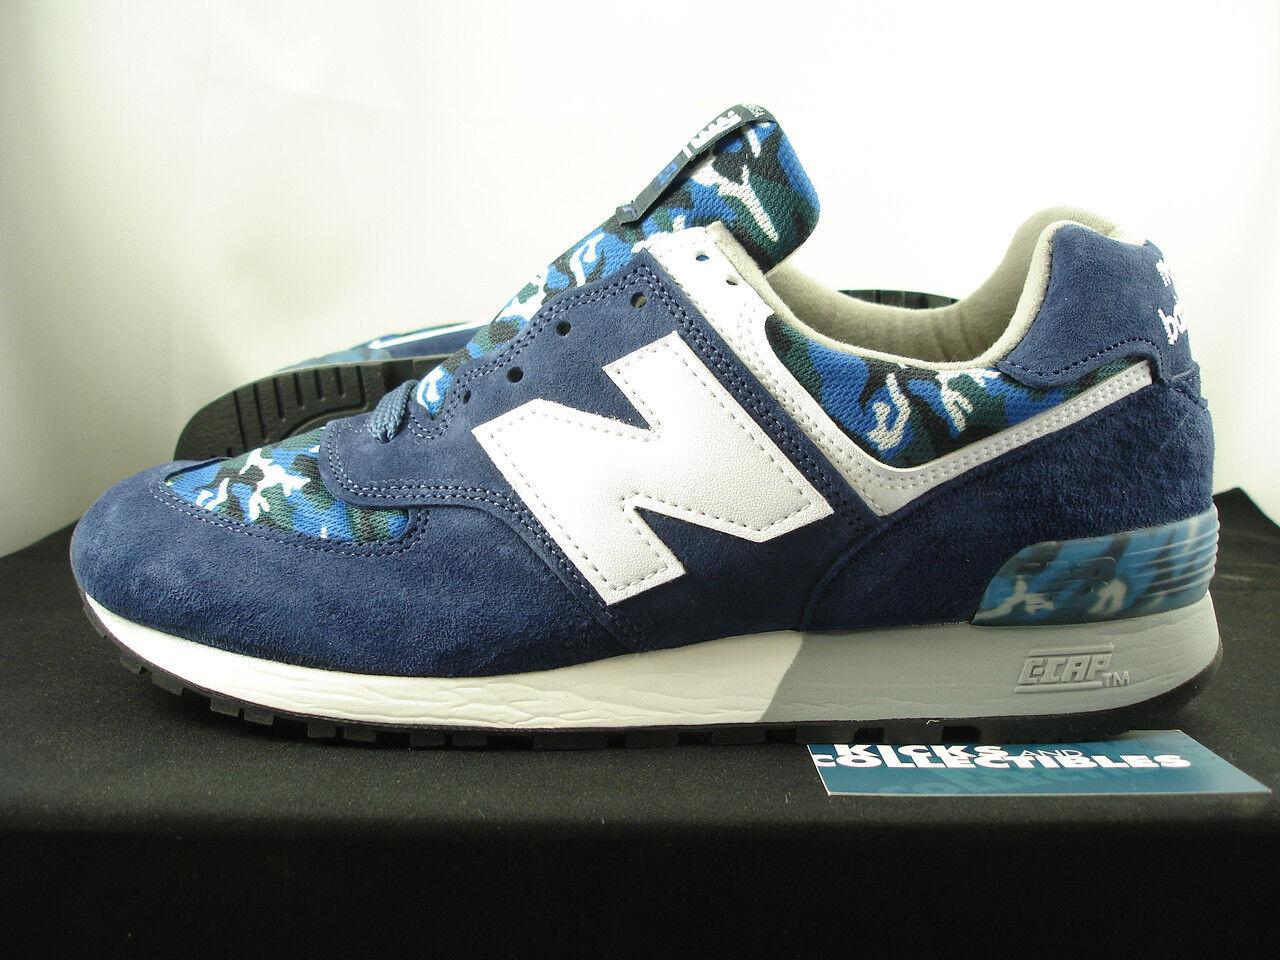 New Balance 576 Made In USA CAMO 12 US576CM1 blue navy burn rubber 577 1600